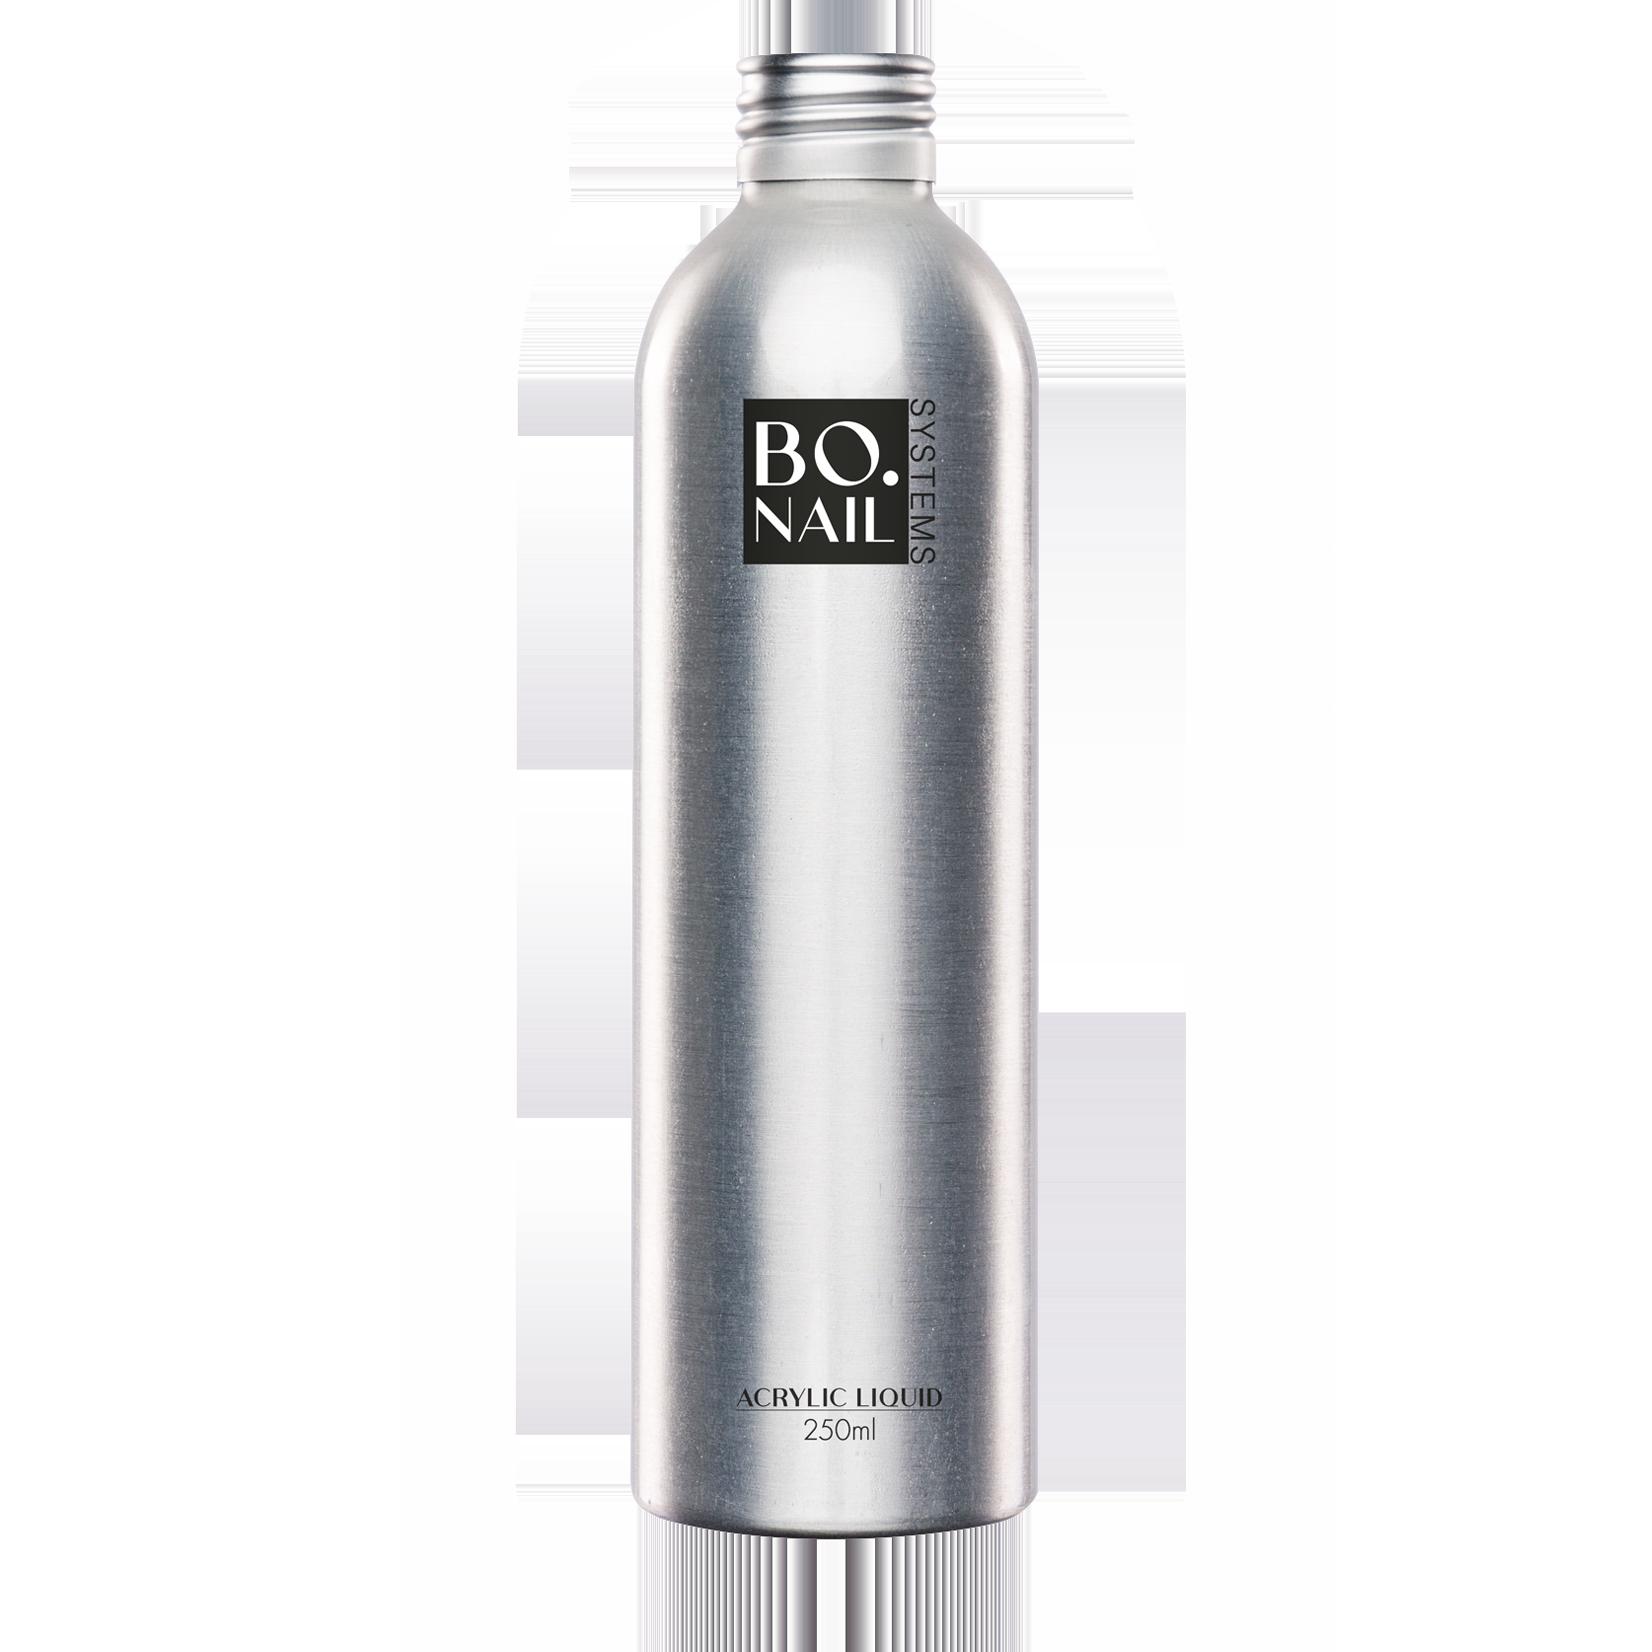 BO Acrylic Liquid 250ml